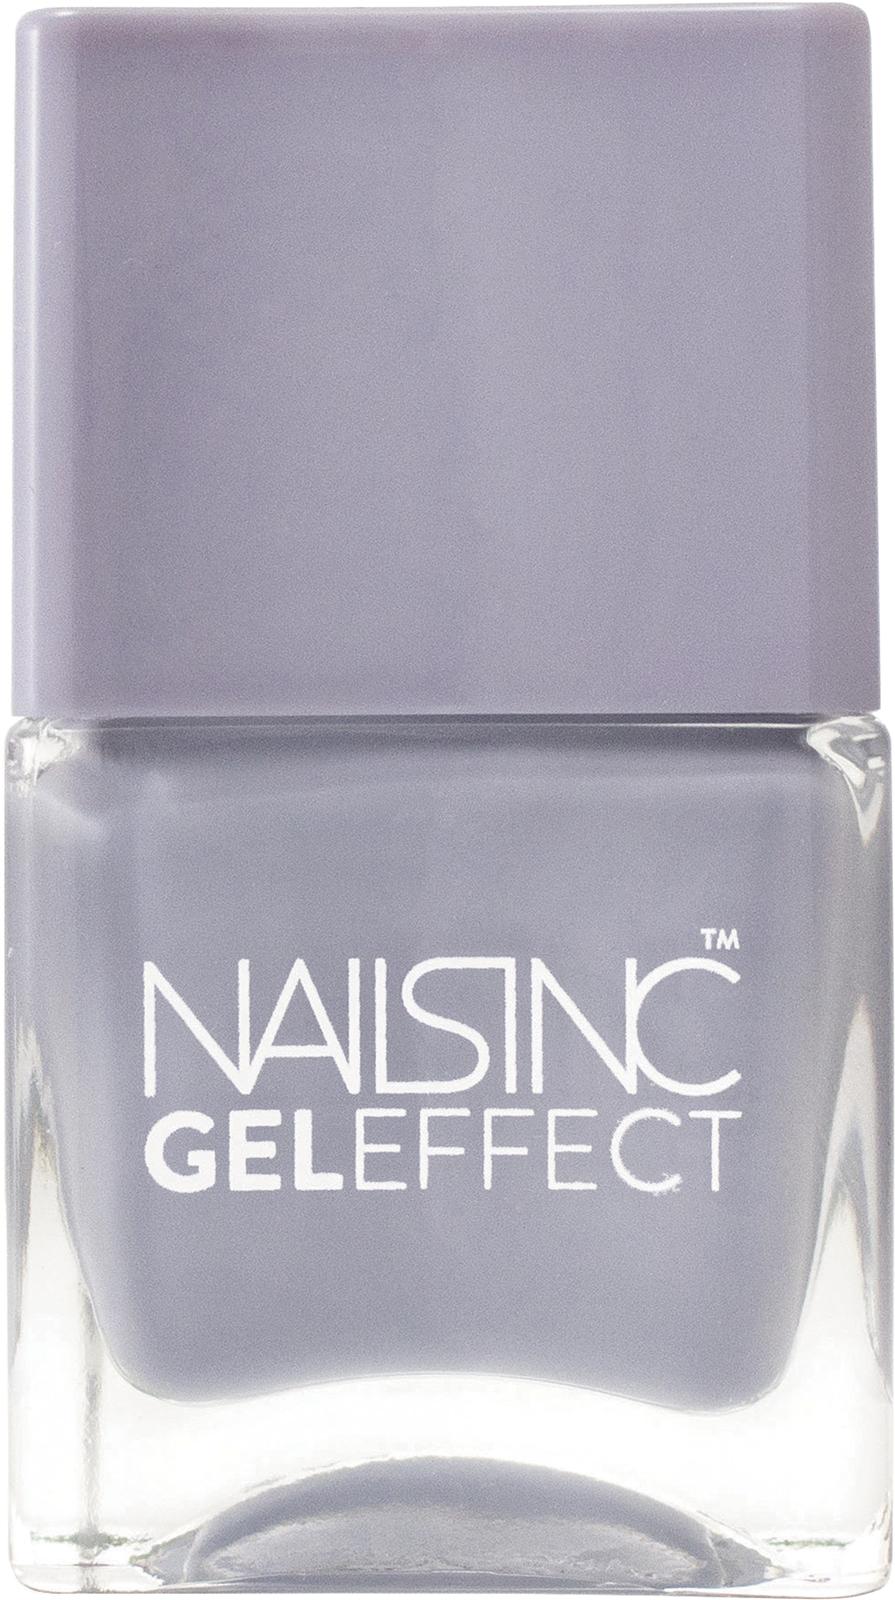 Nails Inc - Gel Effect Nail Lacquer 14 ml - Primrose Hill Lane